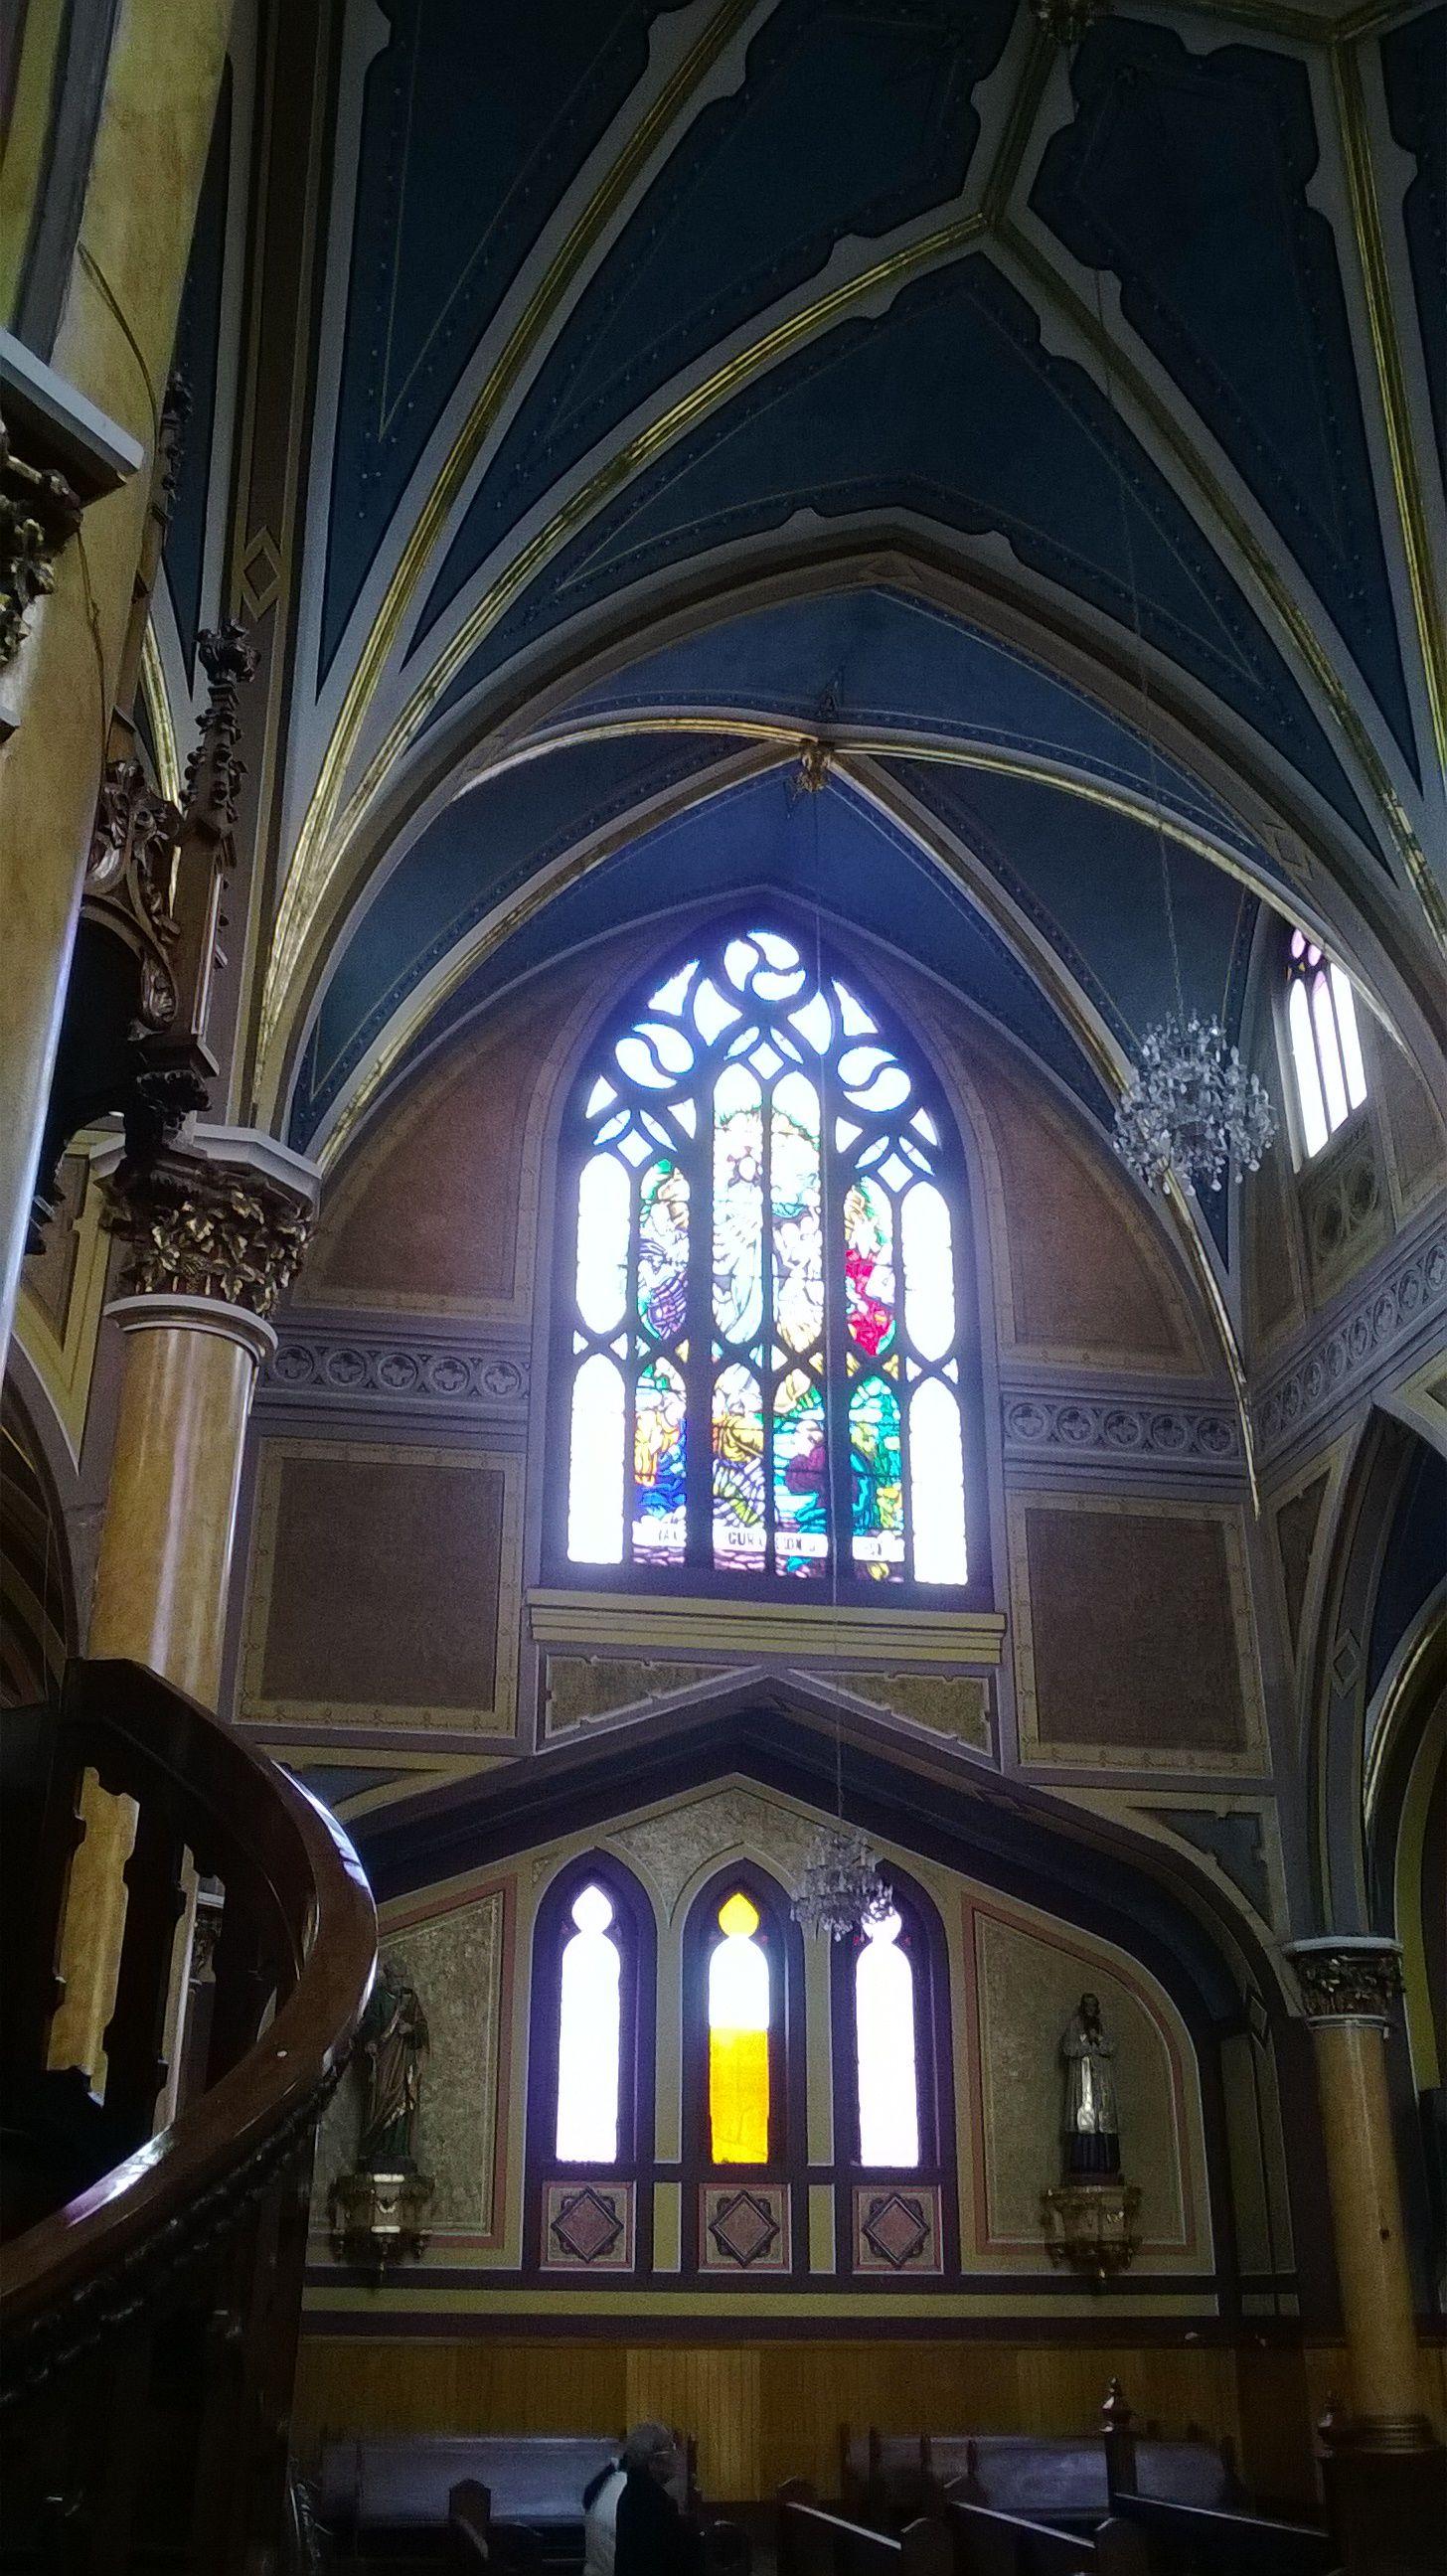 Vitral Iglesia Principal Ubate Boyaca Puertas Pinterest  # Muebles Rusticos Duitama Boyaca